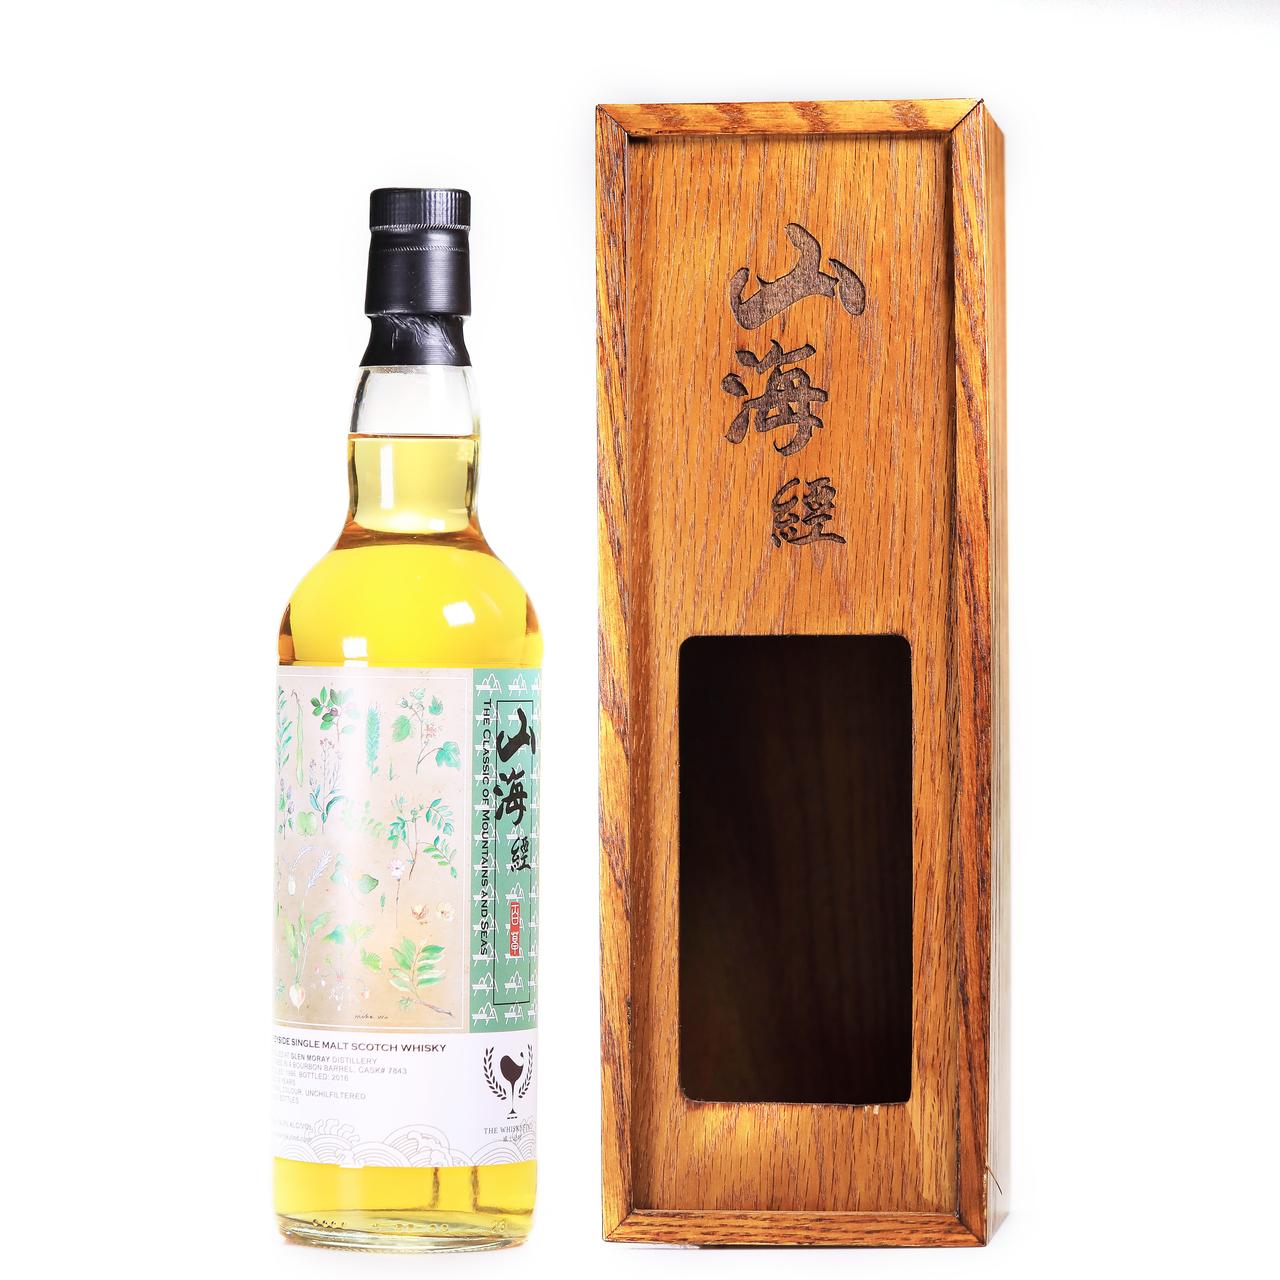 Glen moray 1996 the whisky find 19 year old  7843 %e5%b1%b1%e6%b5%b7%e7%b6%93%e6%8b%b7%e8%b2%9d